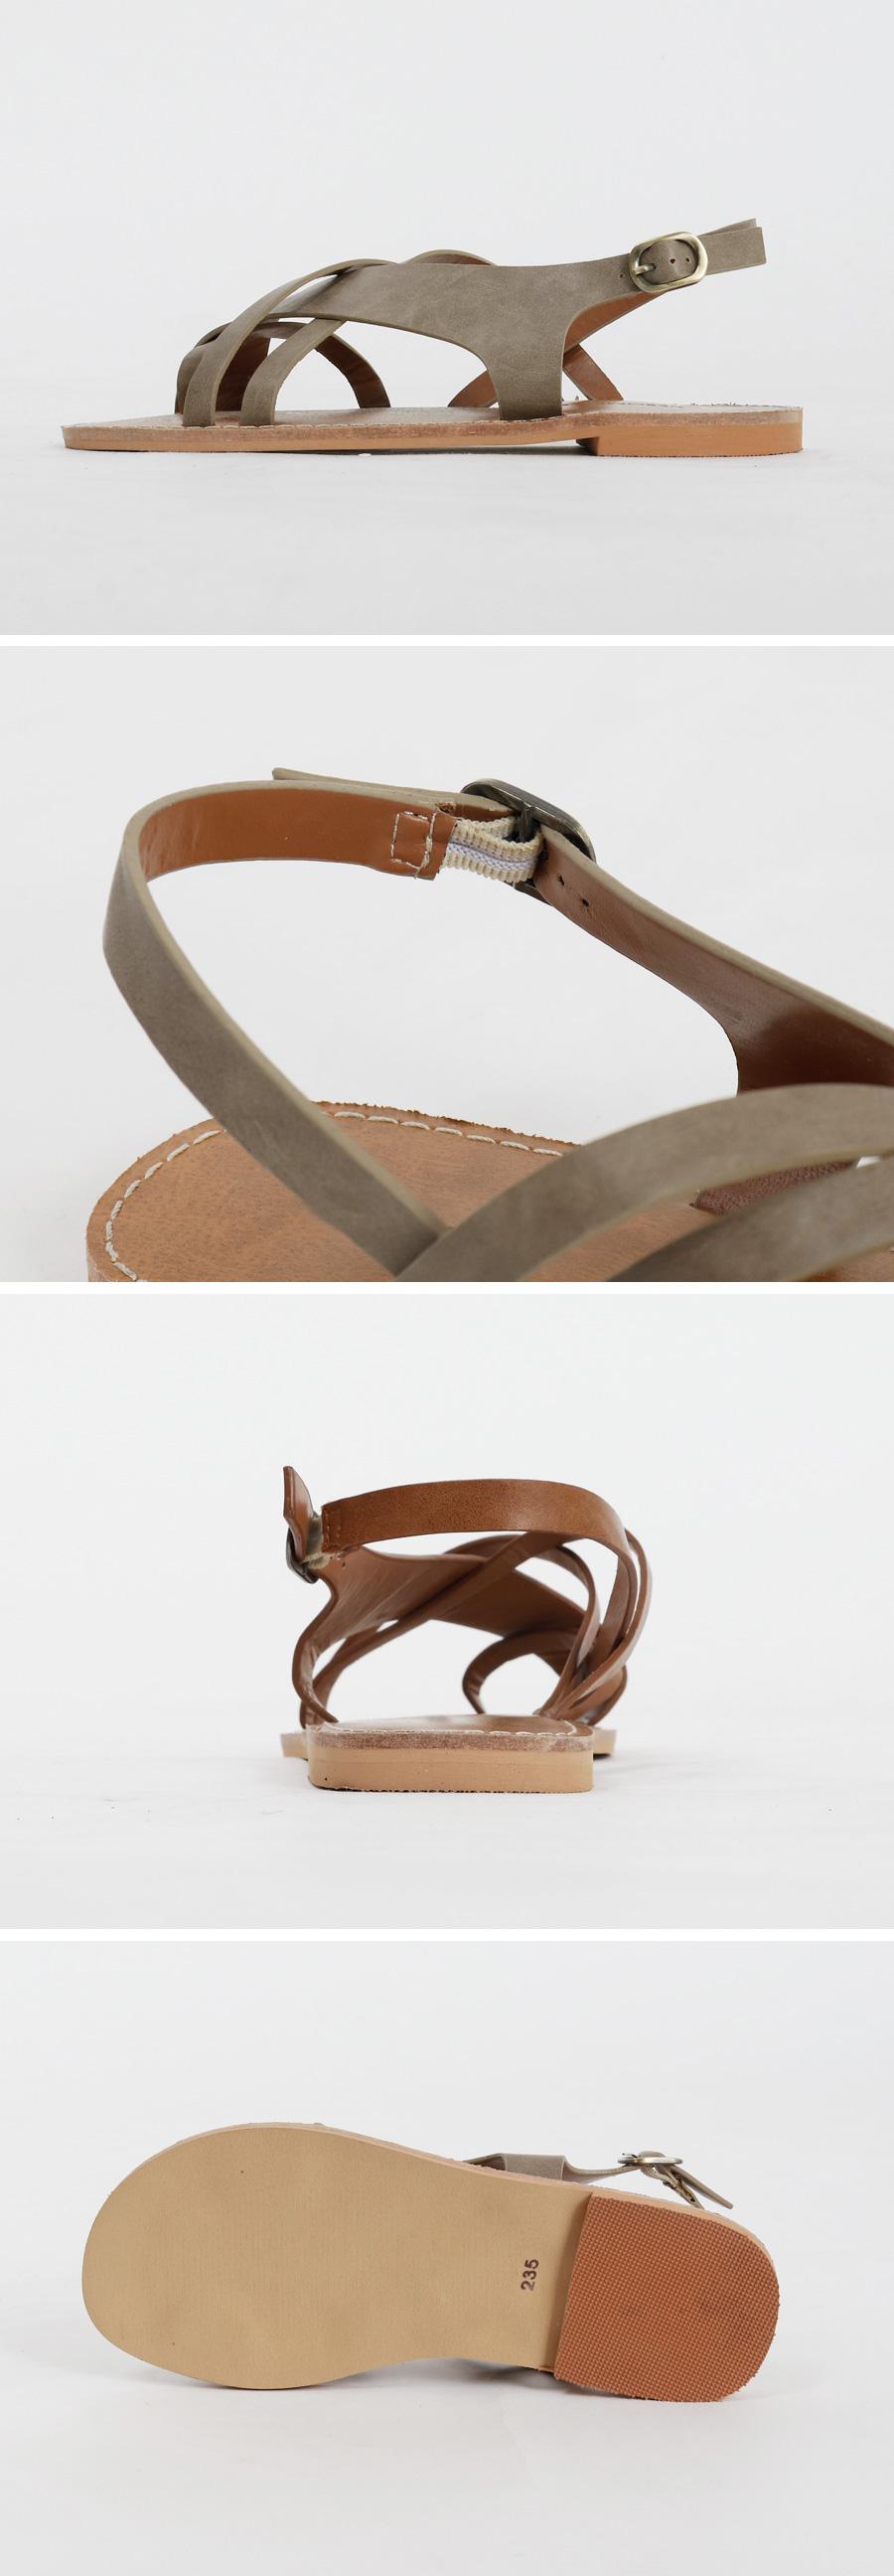 Spider strap sandal_M (size : 225,230,235,240,245,250)